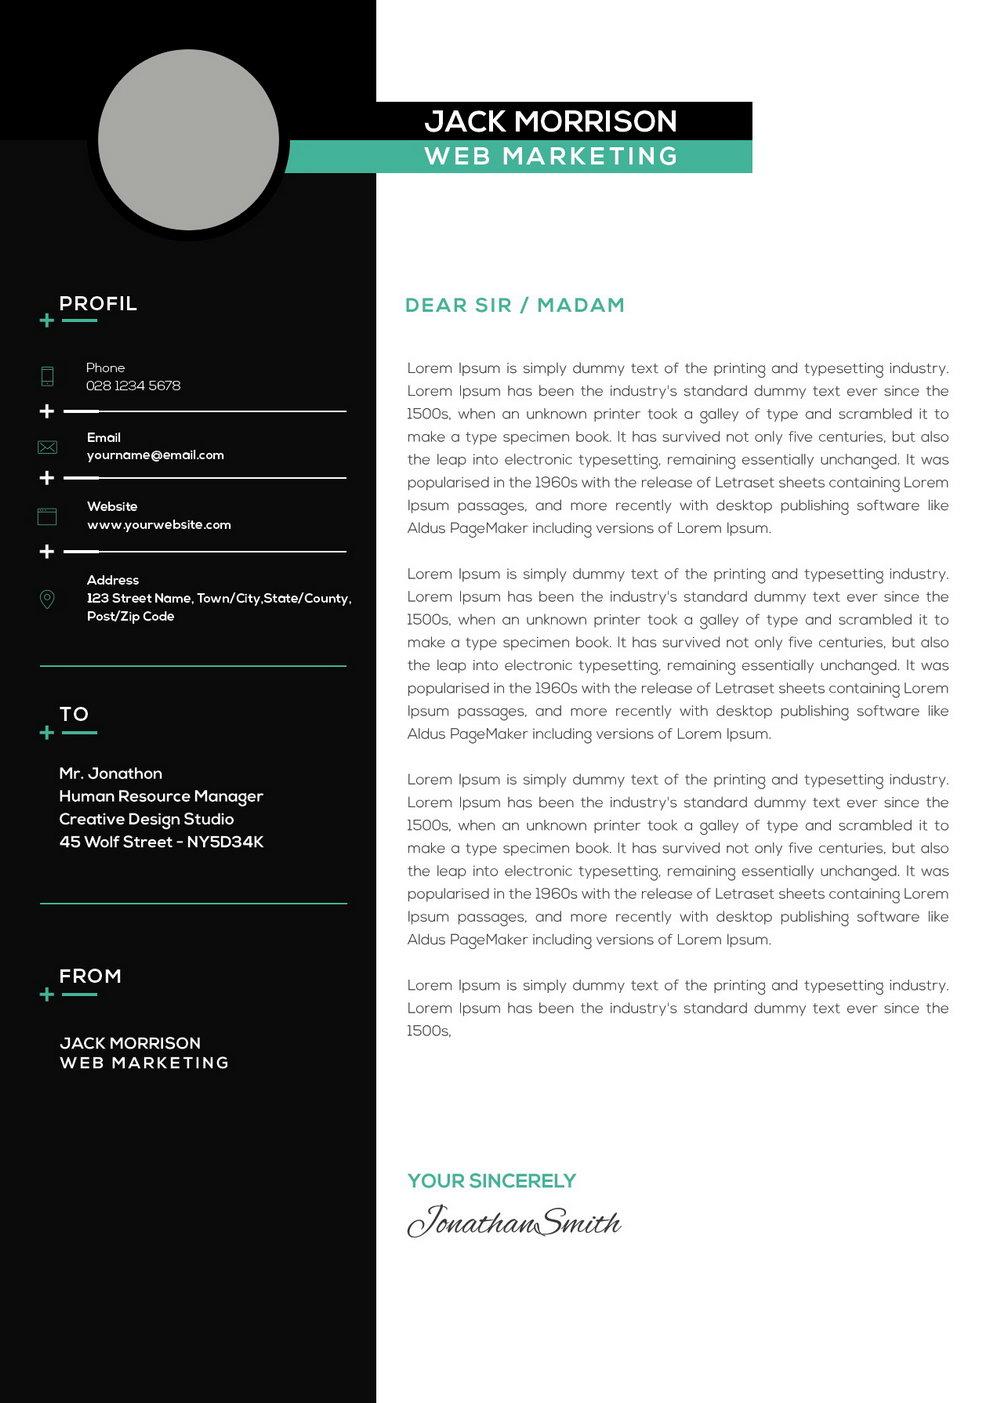 Free Digital Marketing Resume Templates